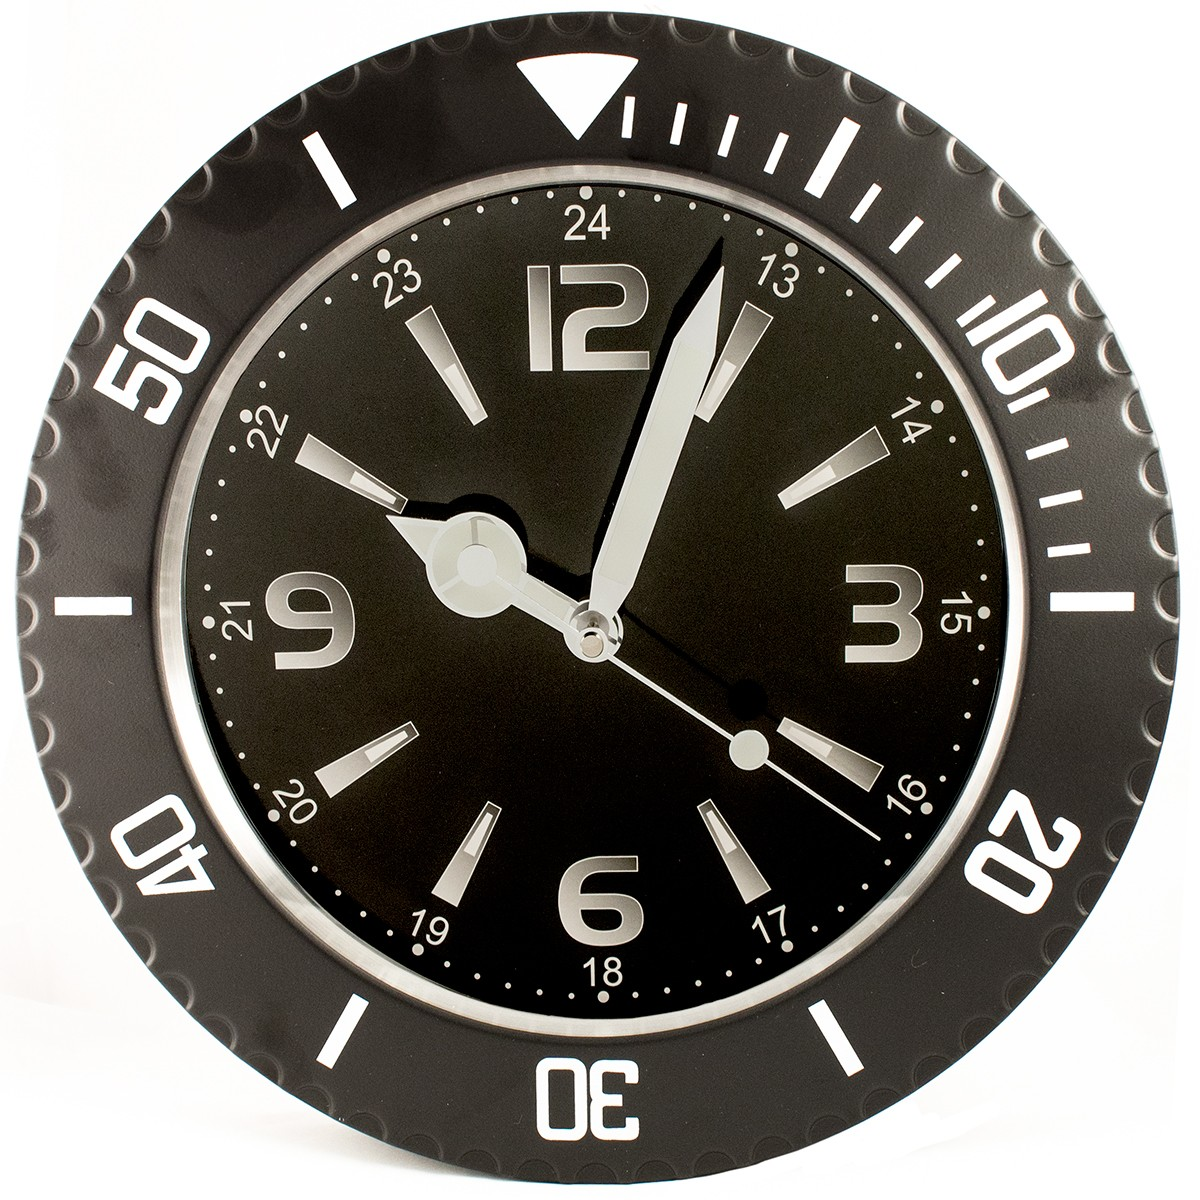 Часы настенные Командирские N1